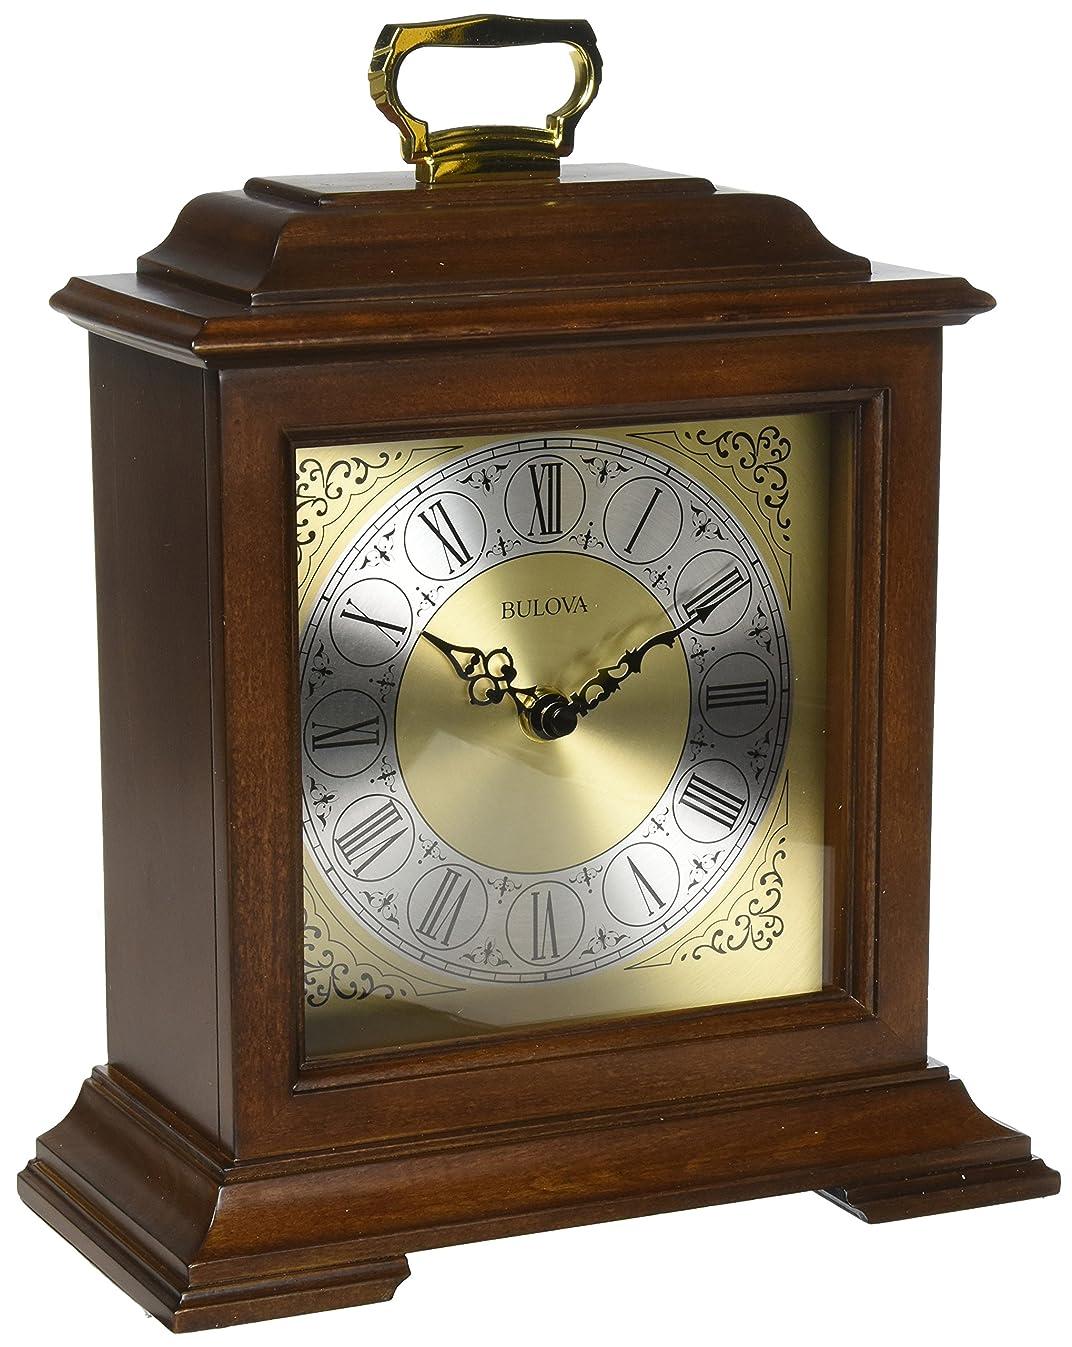 Bulova B1512 Exeter Mantel Chiming Clock, Dark Cherry Brown